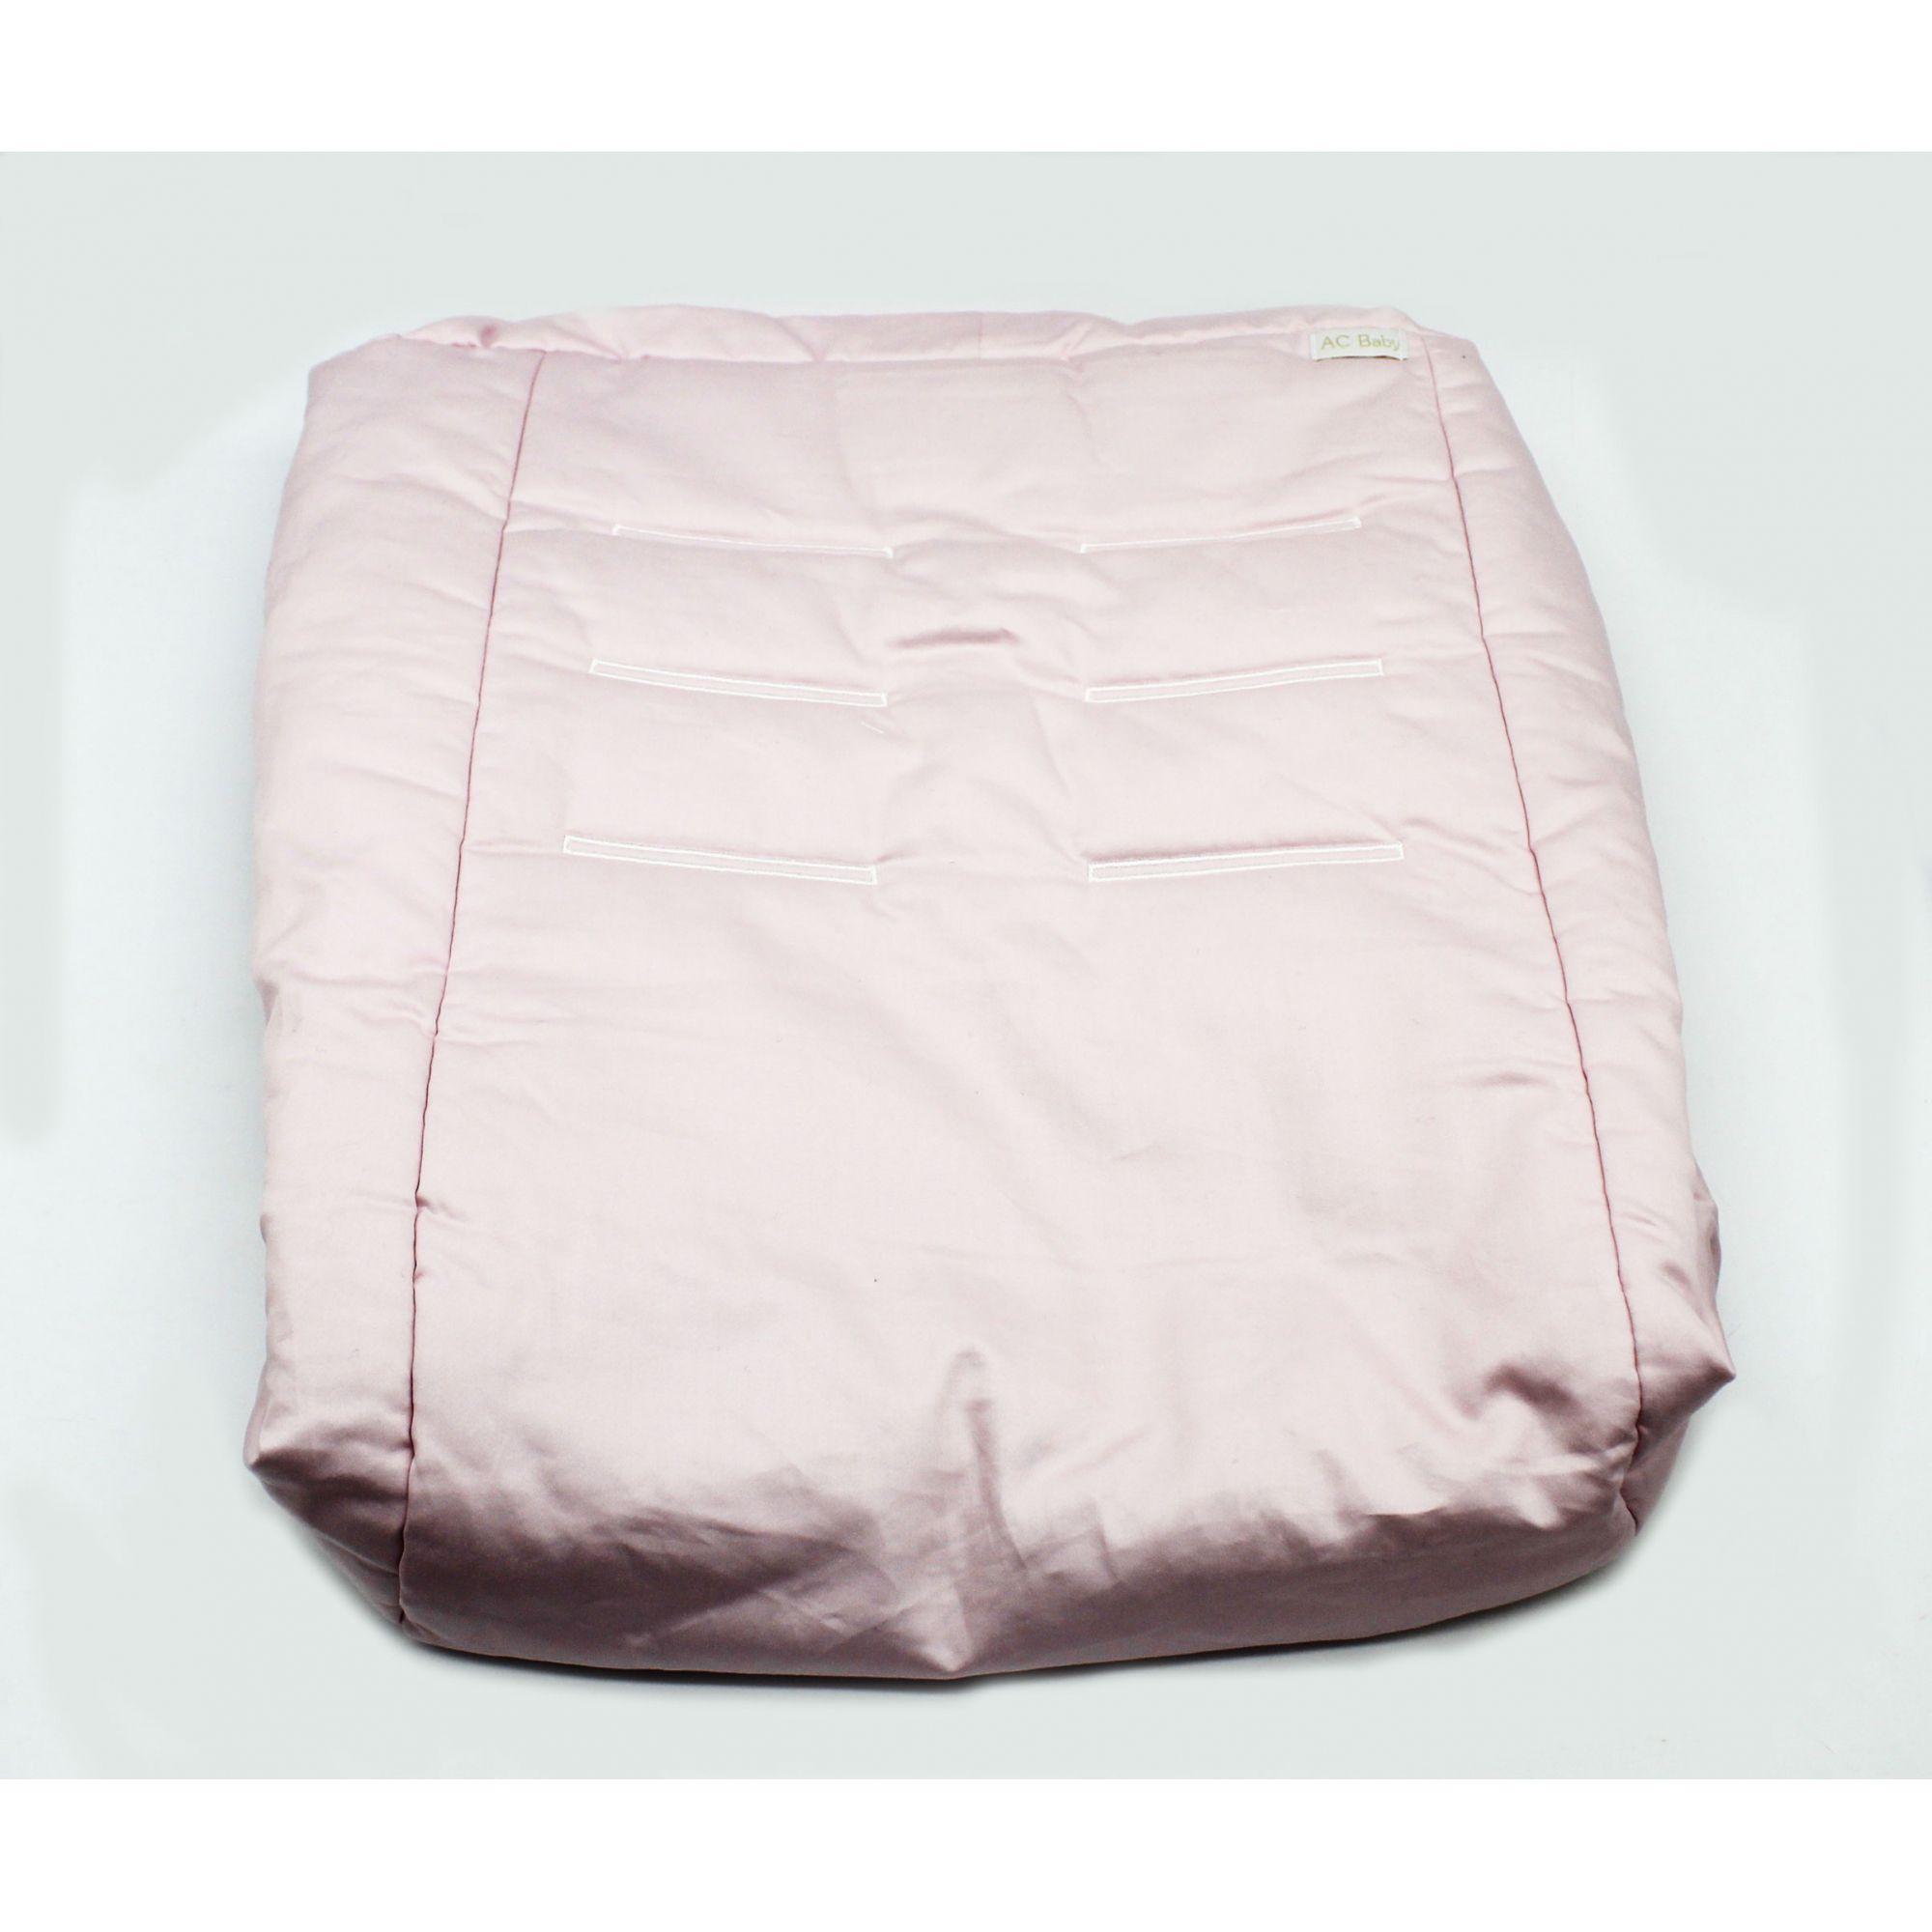 Capa de Bebe Conforto Tricoline Rosa Quartzo 400 Fios - Ac Baby Ref 06248 86U